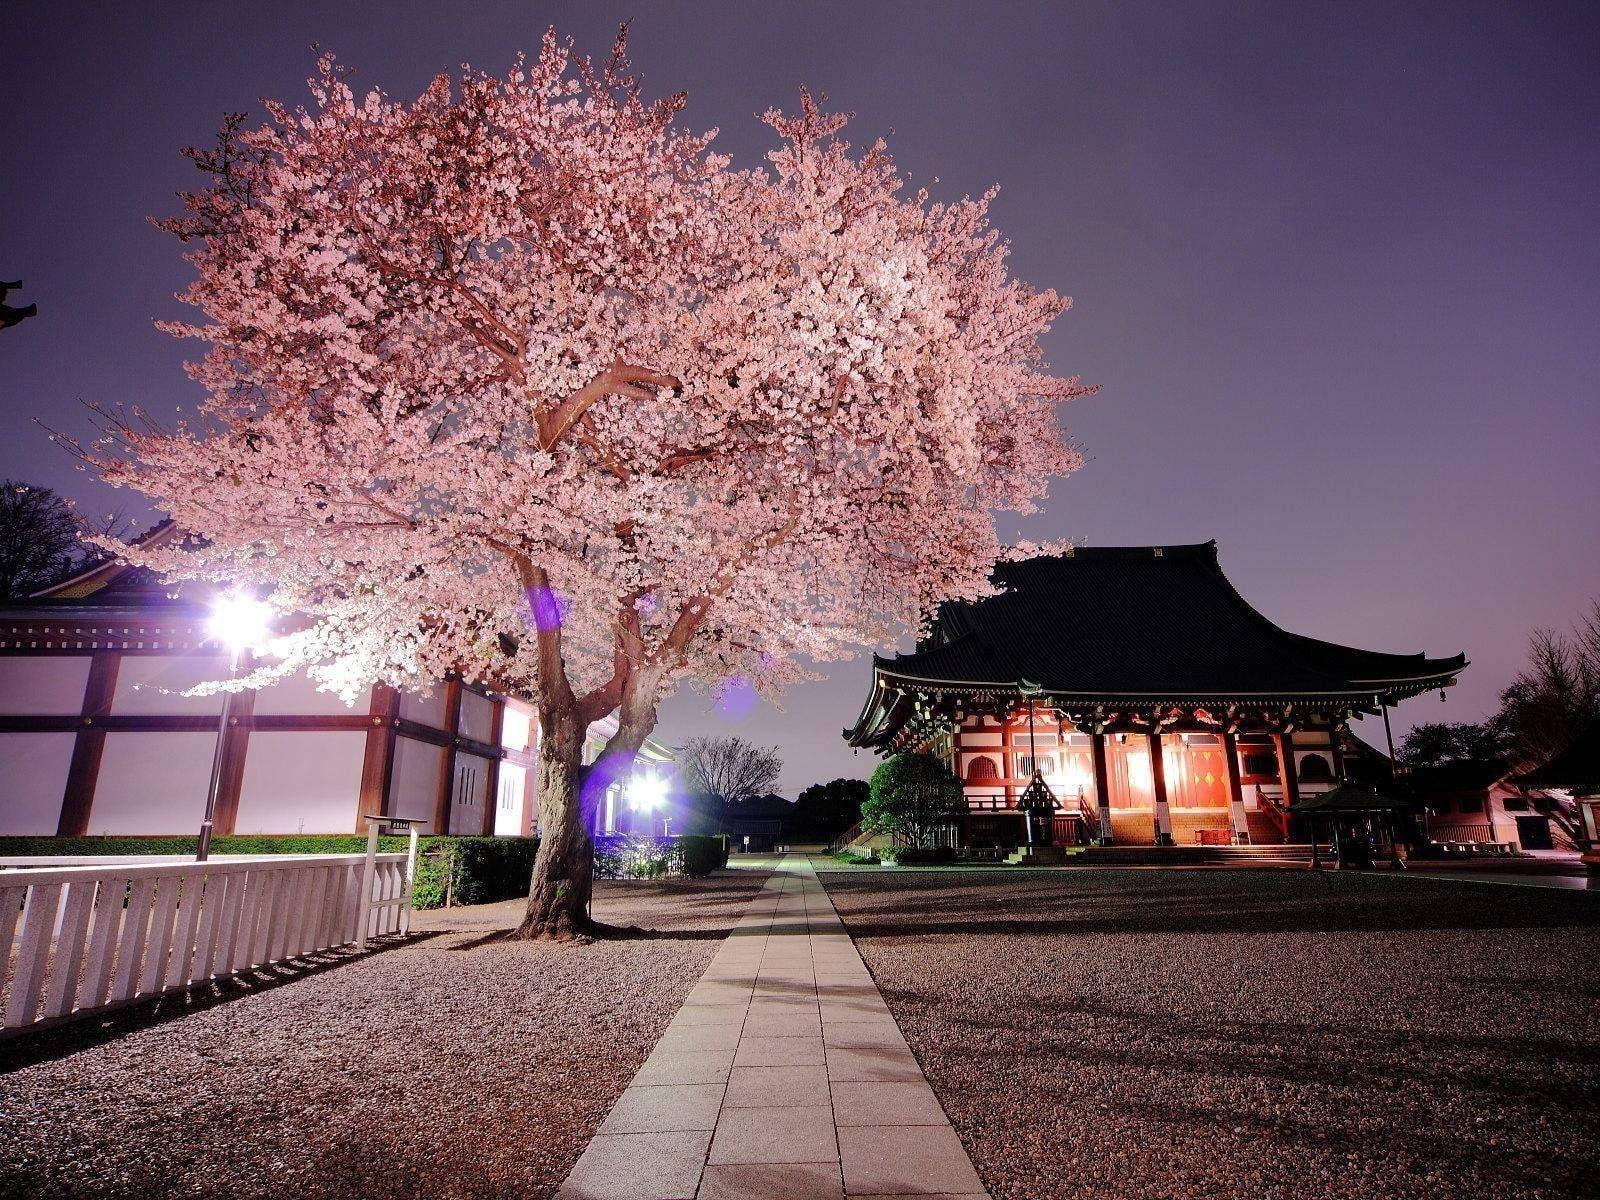 cherry blossom tree nature Japan cherry blossom 720P